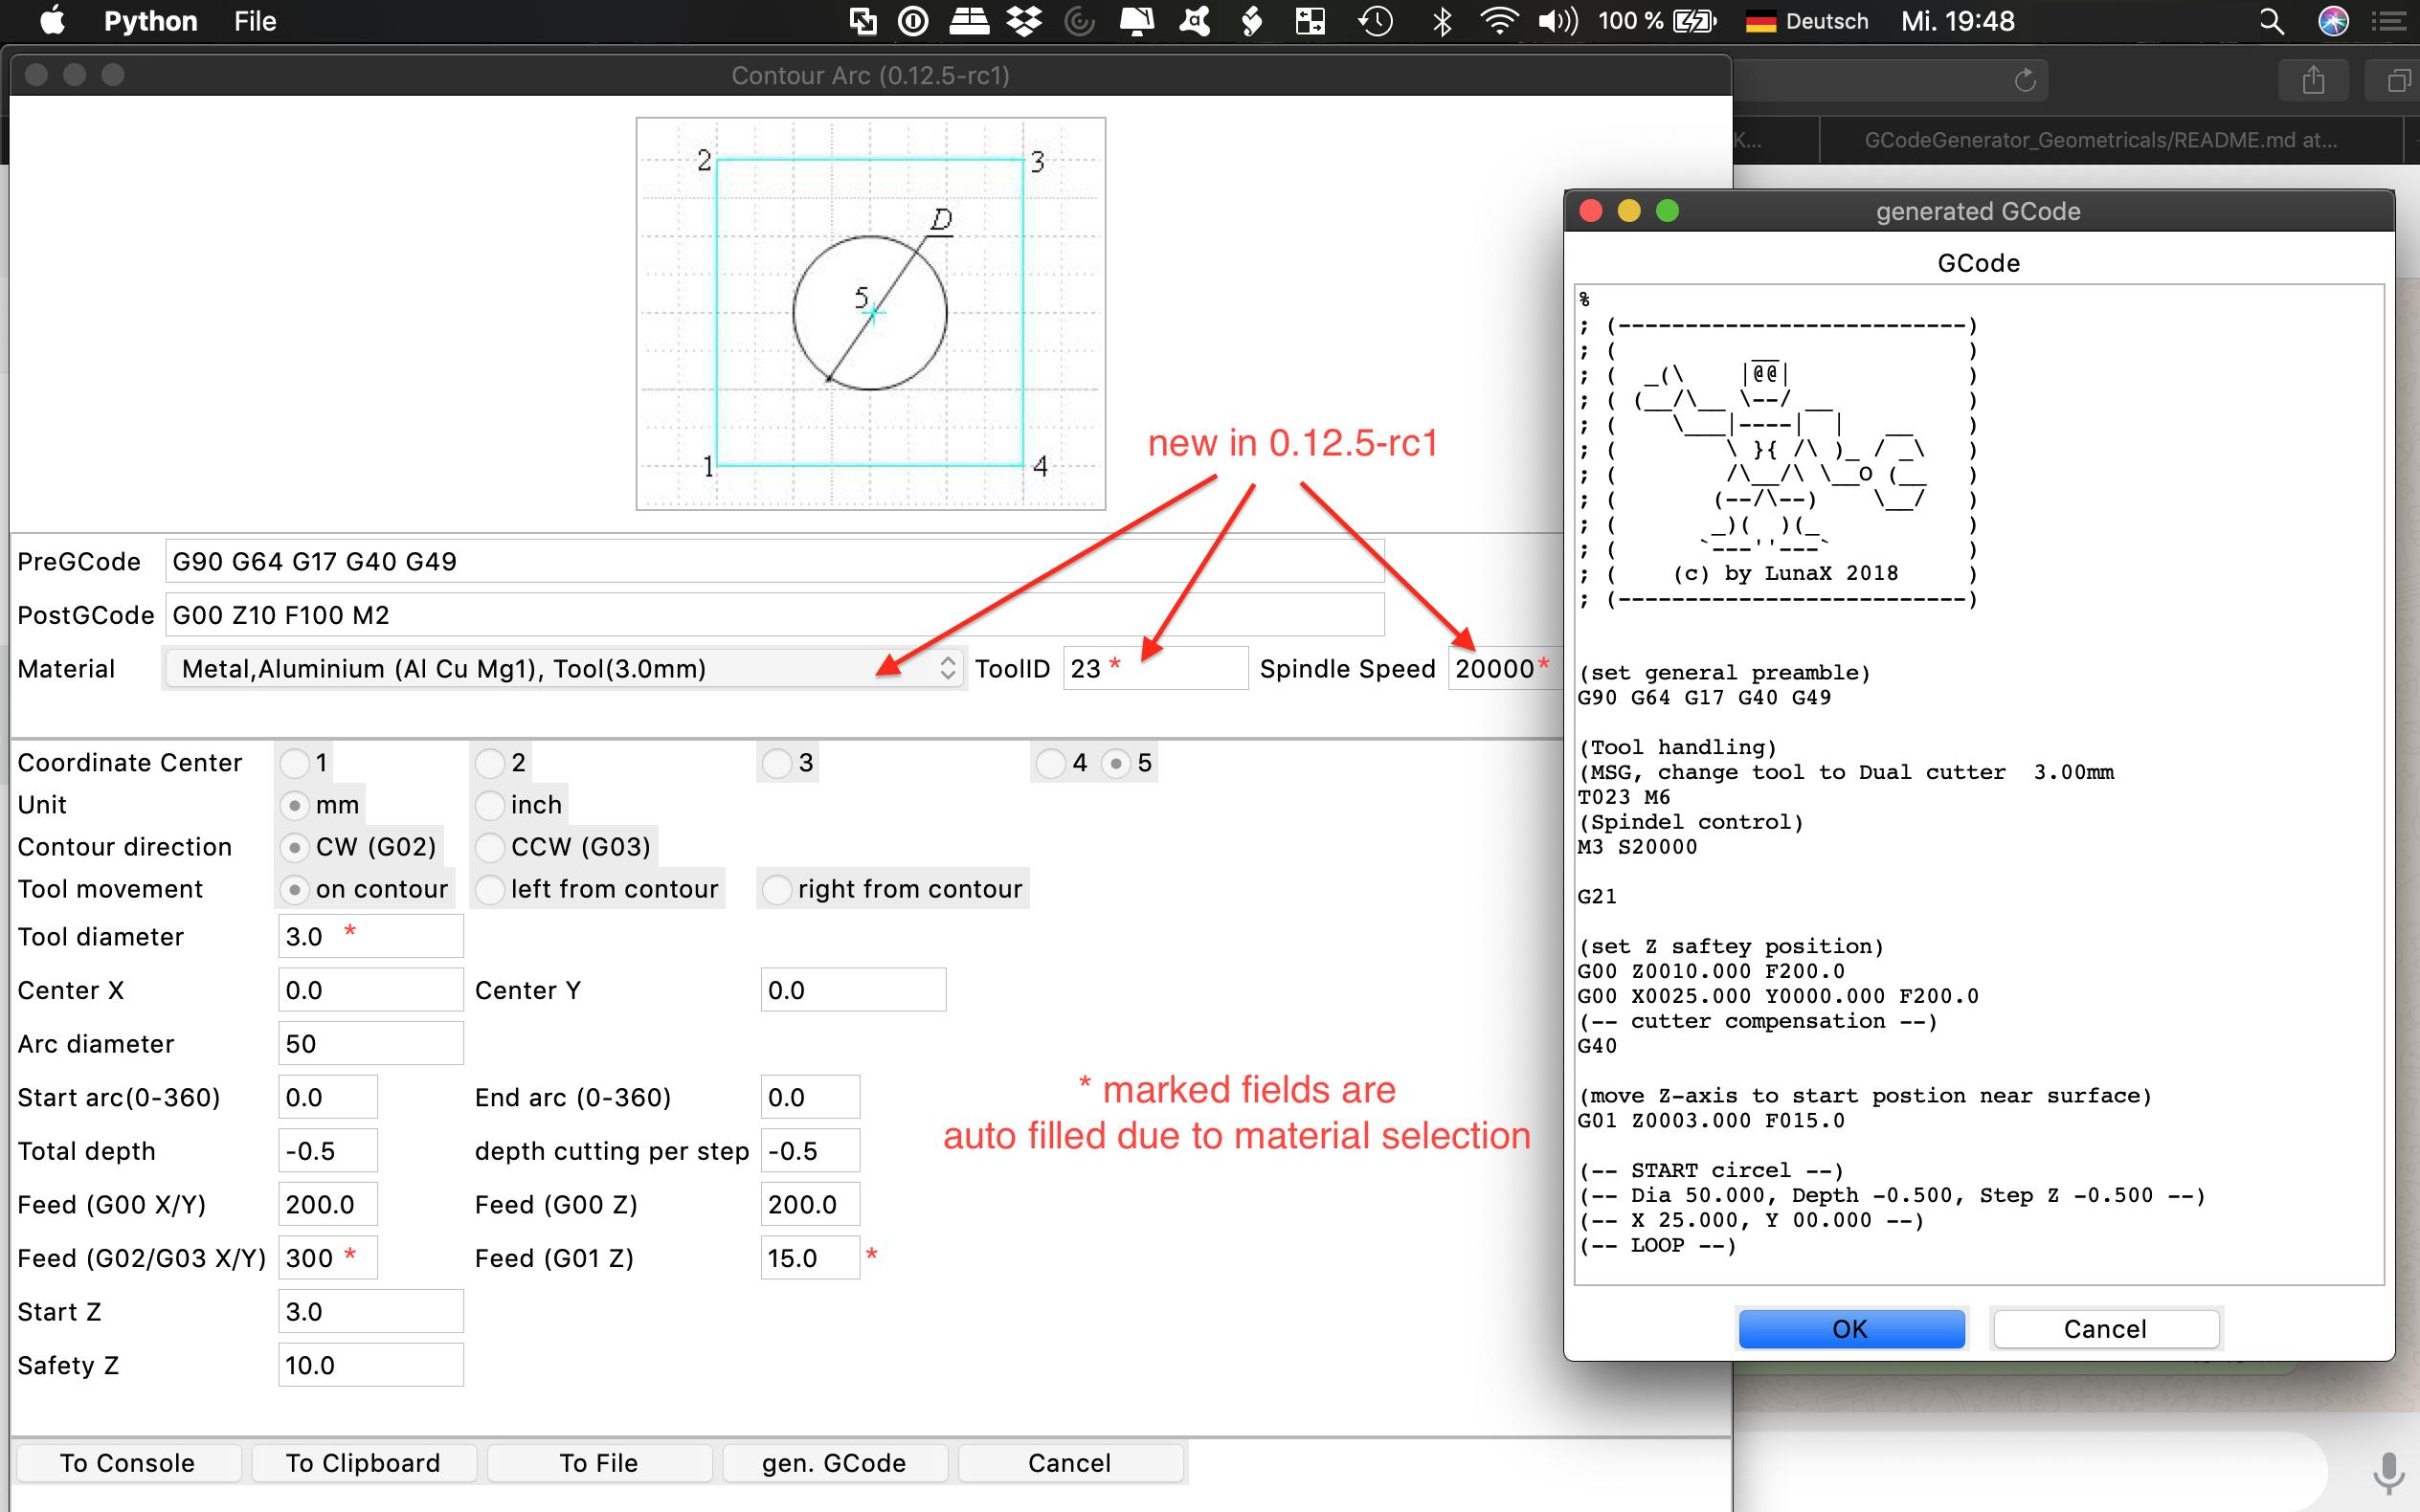 GitHub - mrRobot62/GCodeGenerator_Geometricals: Easy and simple to